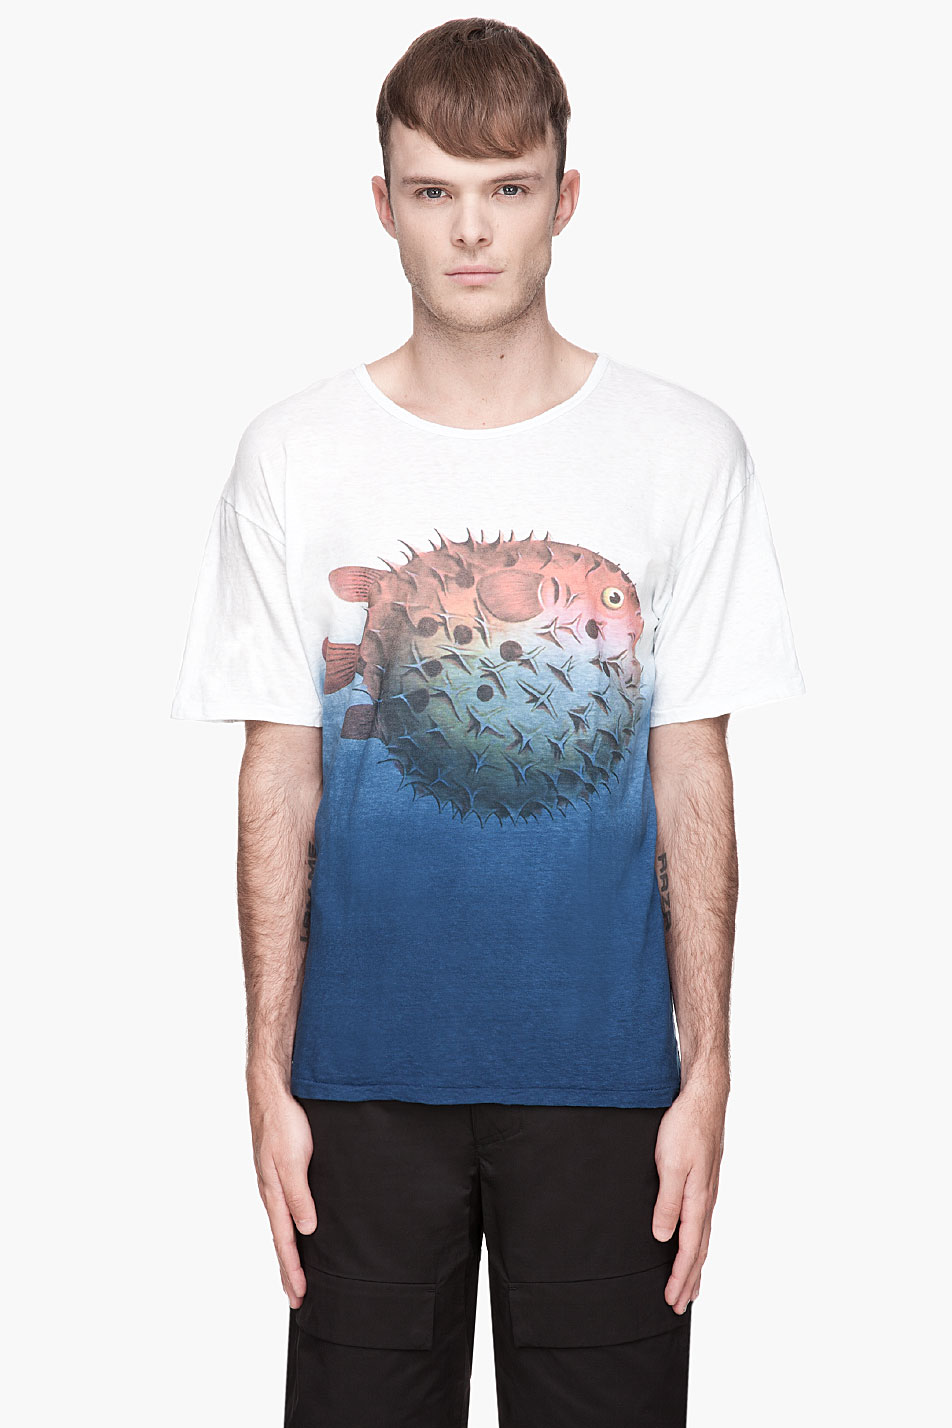 SASQUATCHfabrix blue ombre balloonfish t-shirt